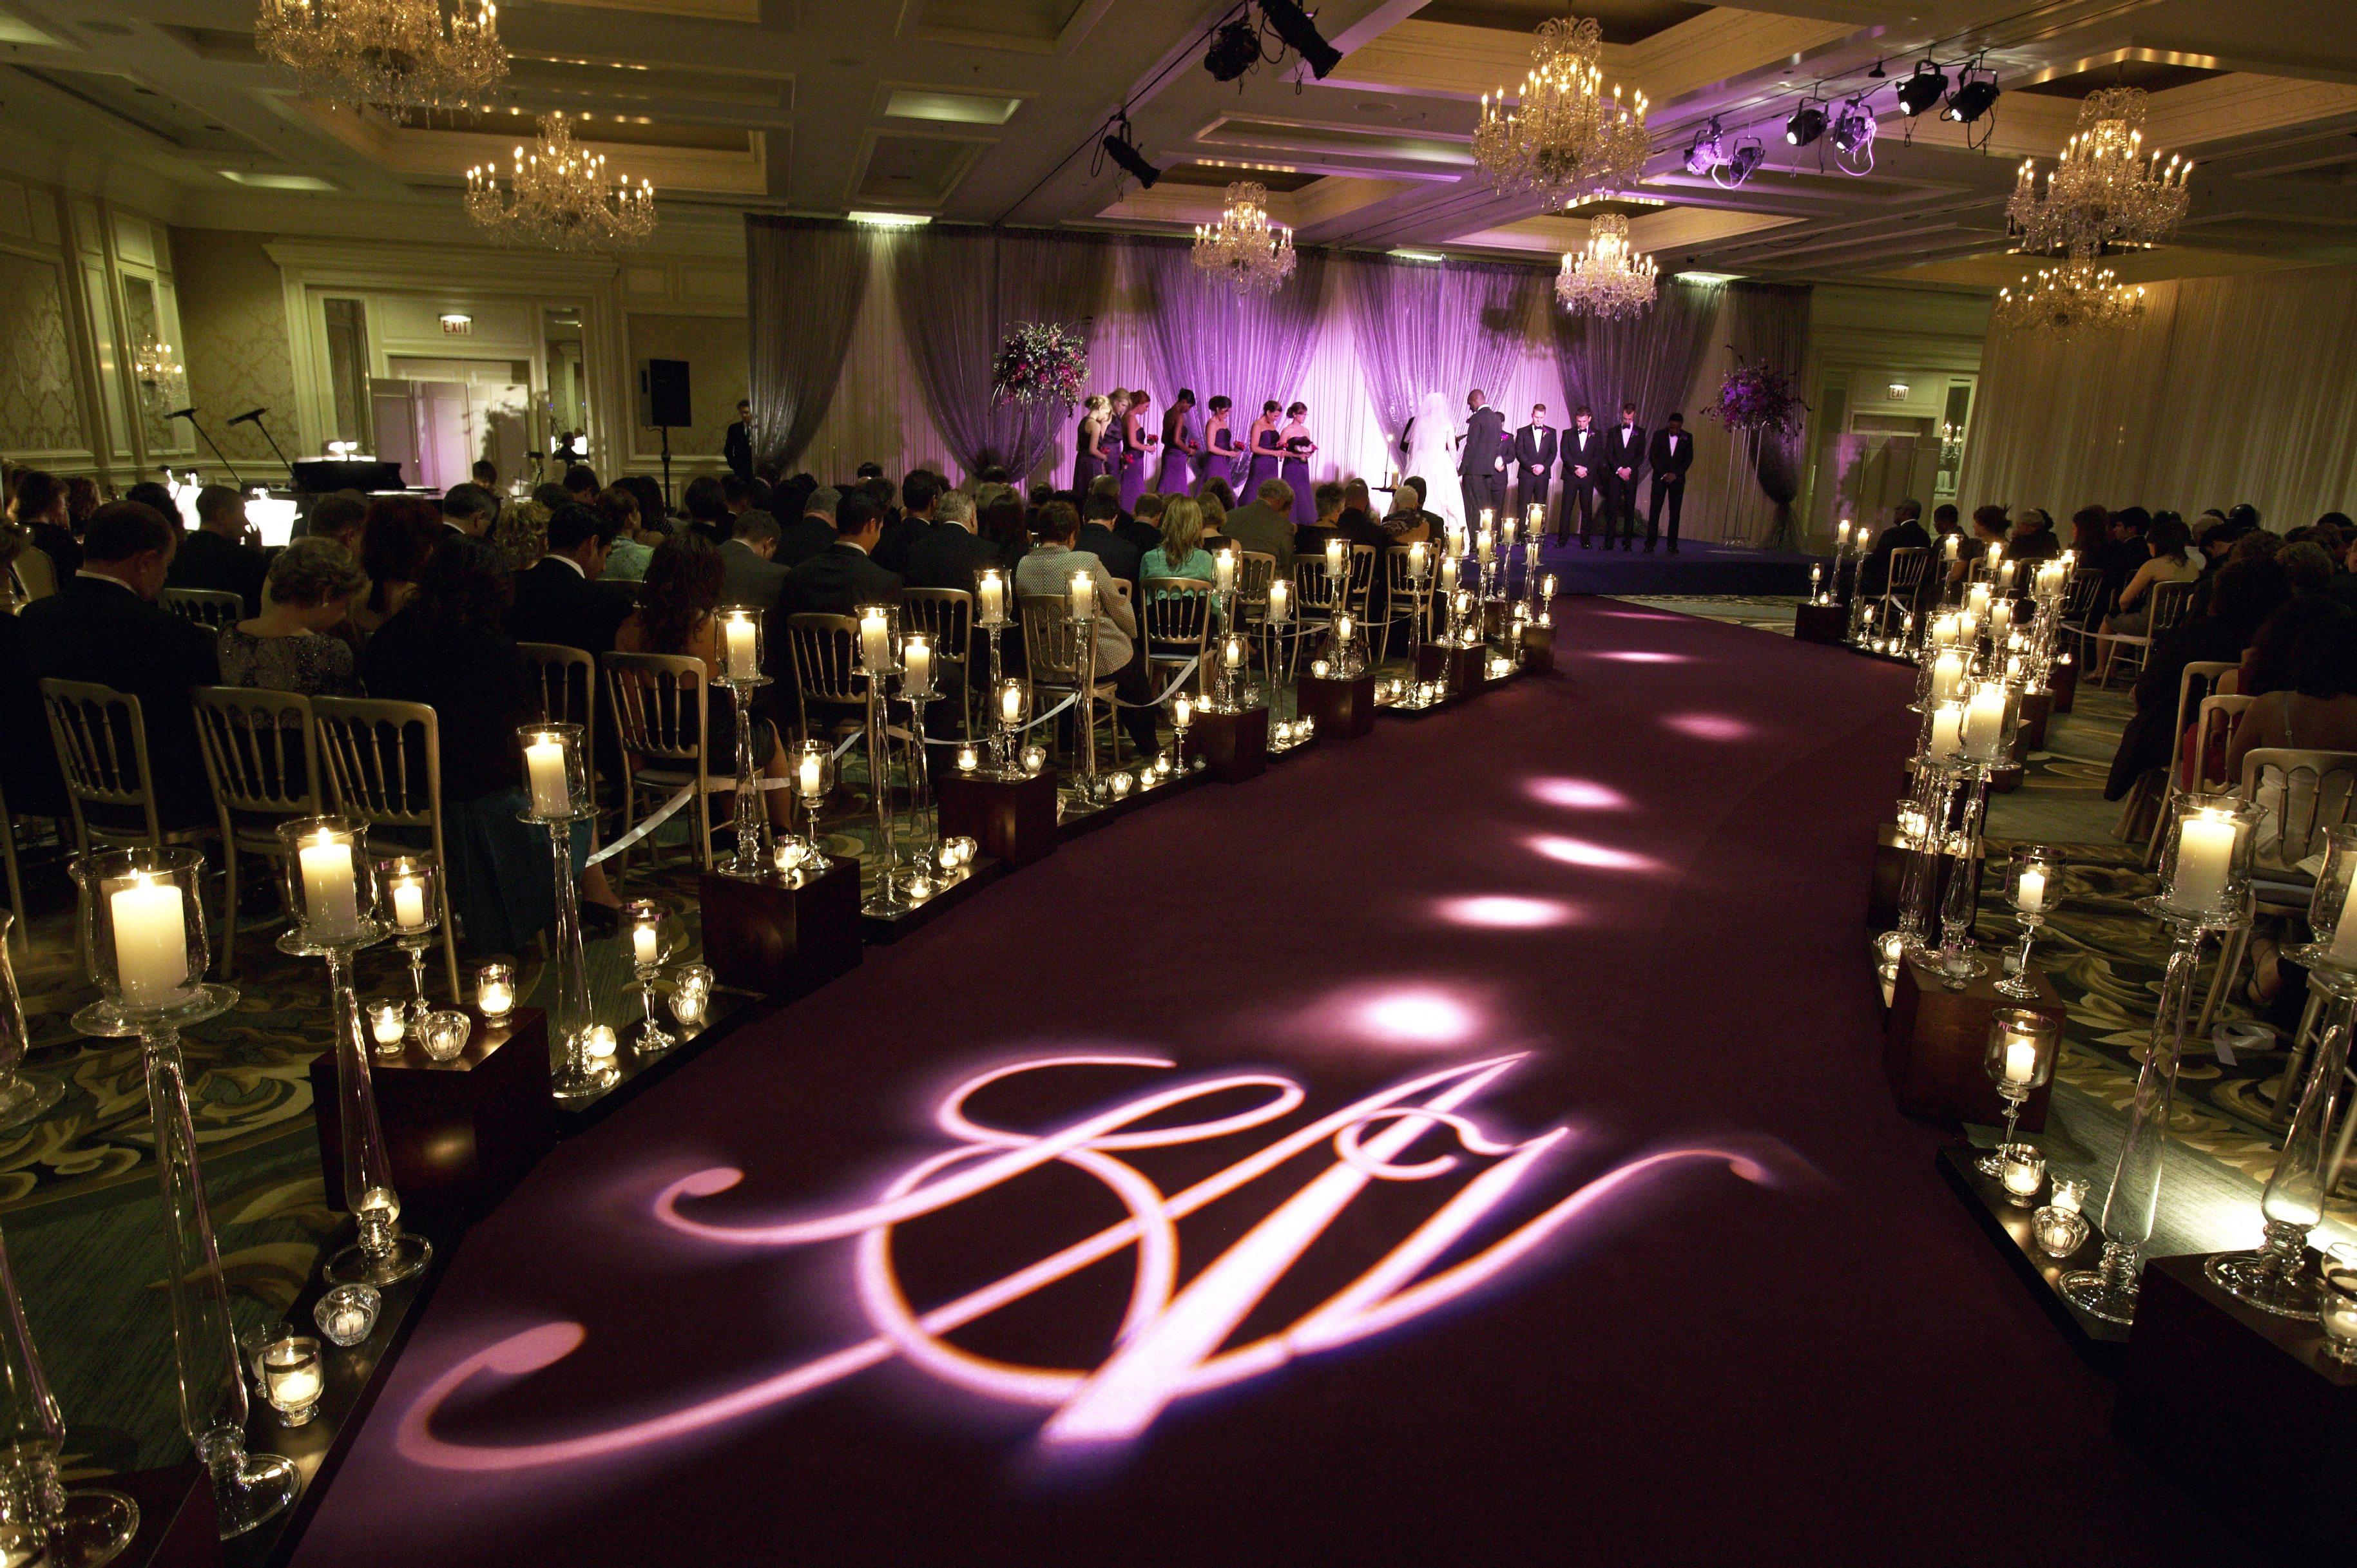 virgil abloh wedding ceremony purple decor romantic light projections 2019 popular real weddings